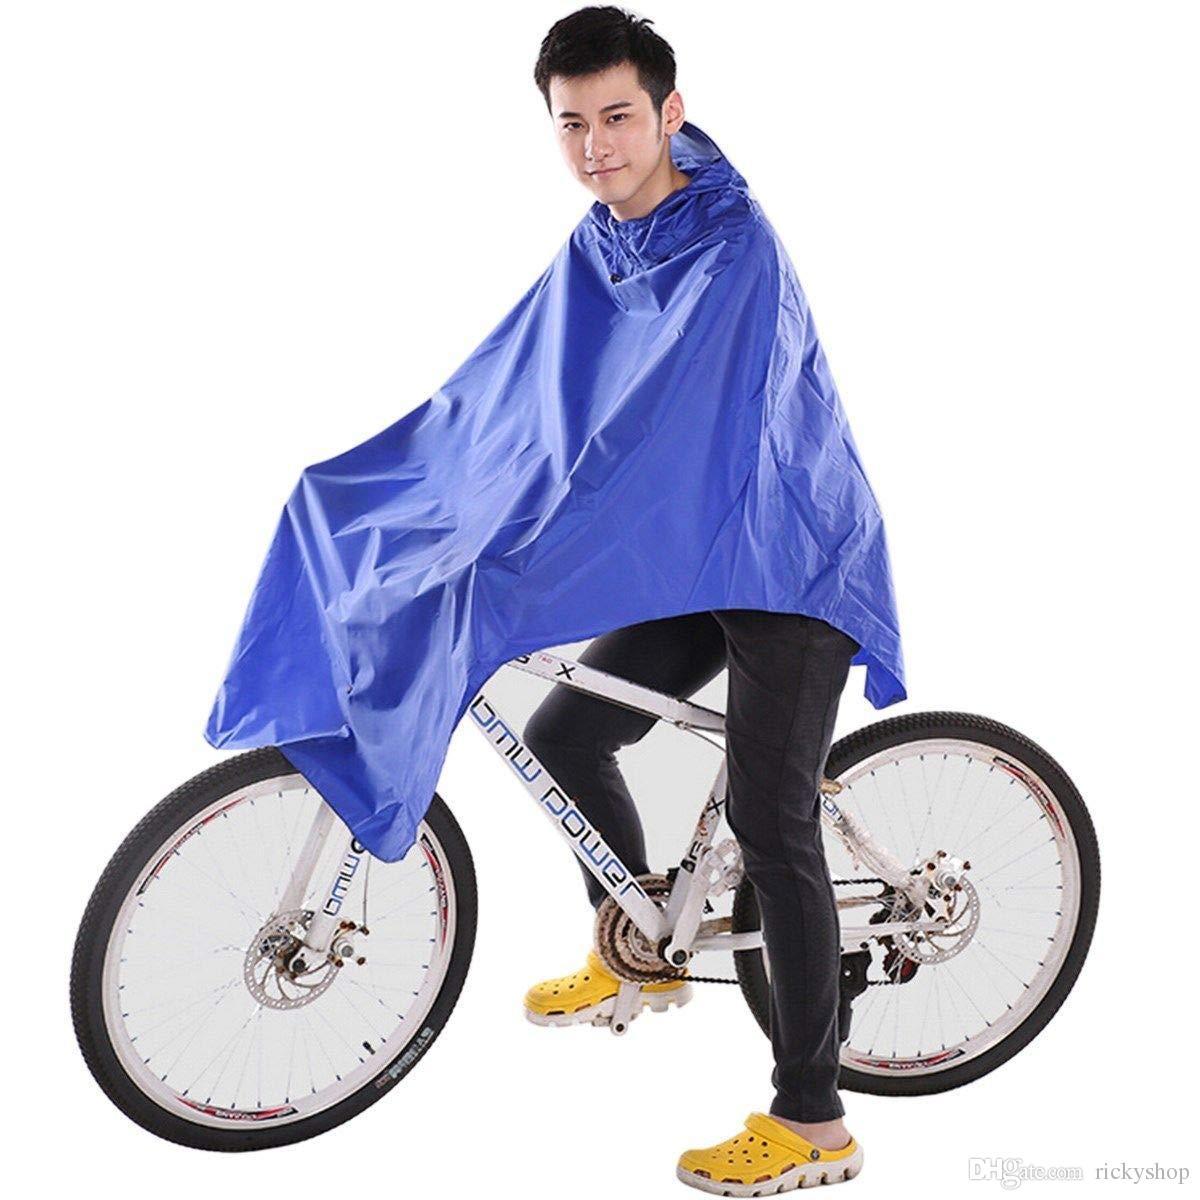 Ting Ao Cycling Bicycle Bike Raincoat Rain Cape Poncho Cloth Gear Rainproof Blue Comfort